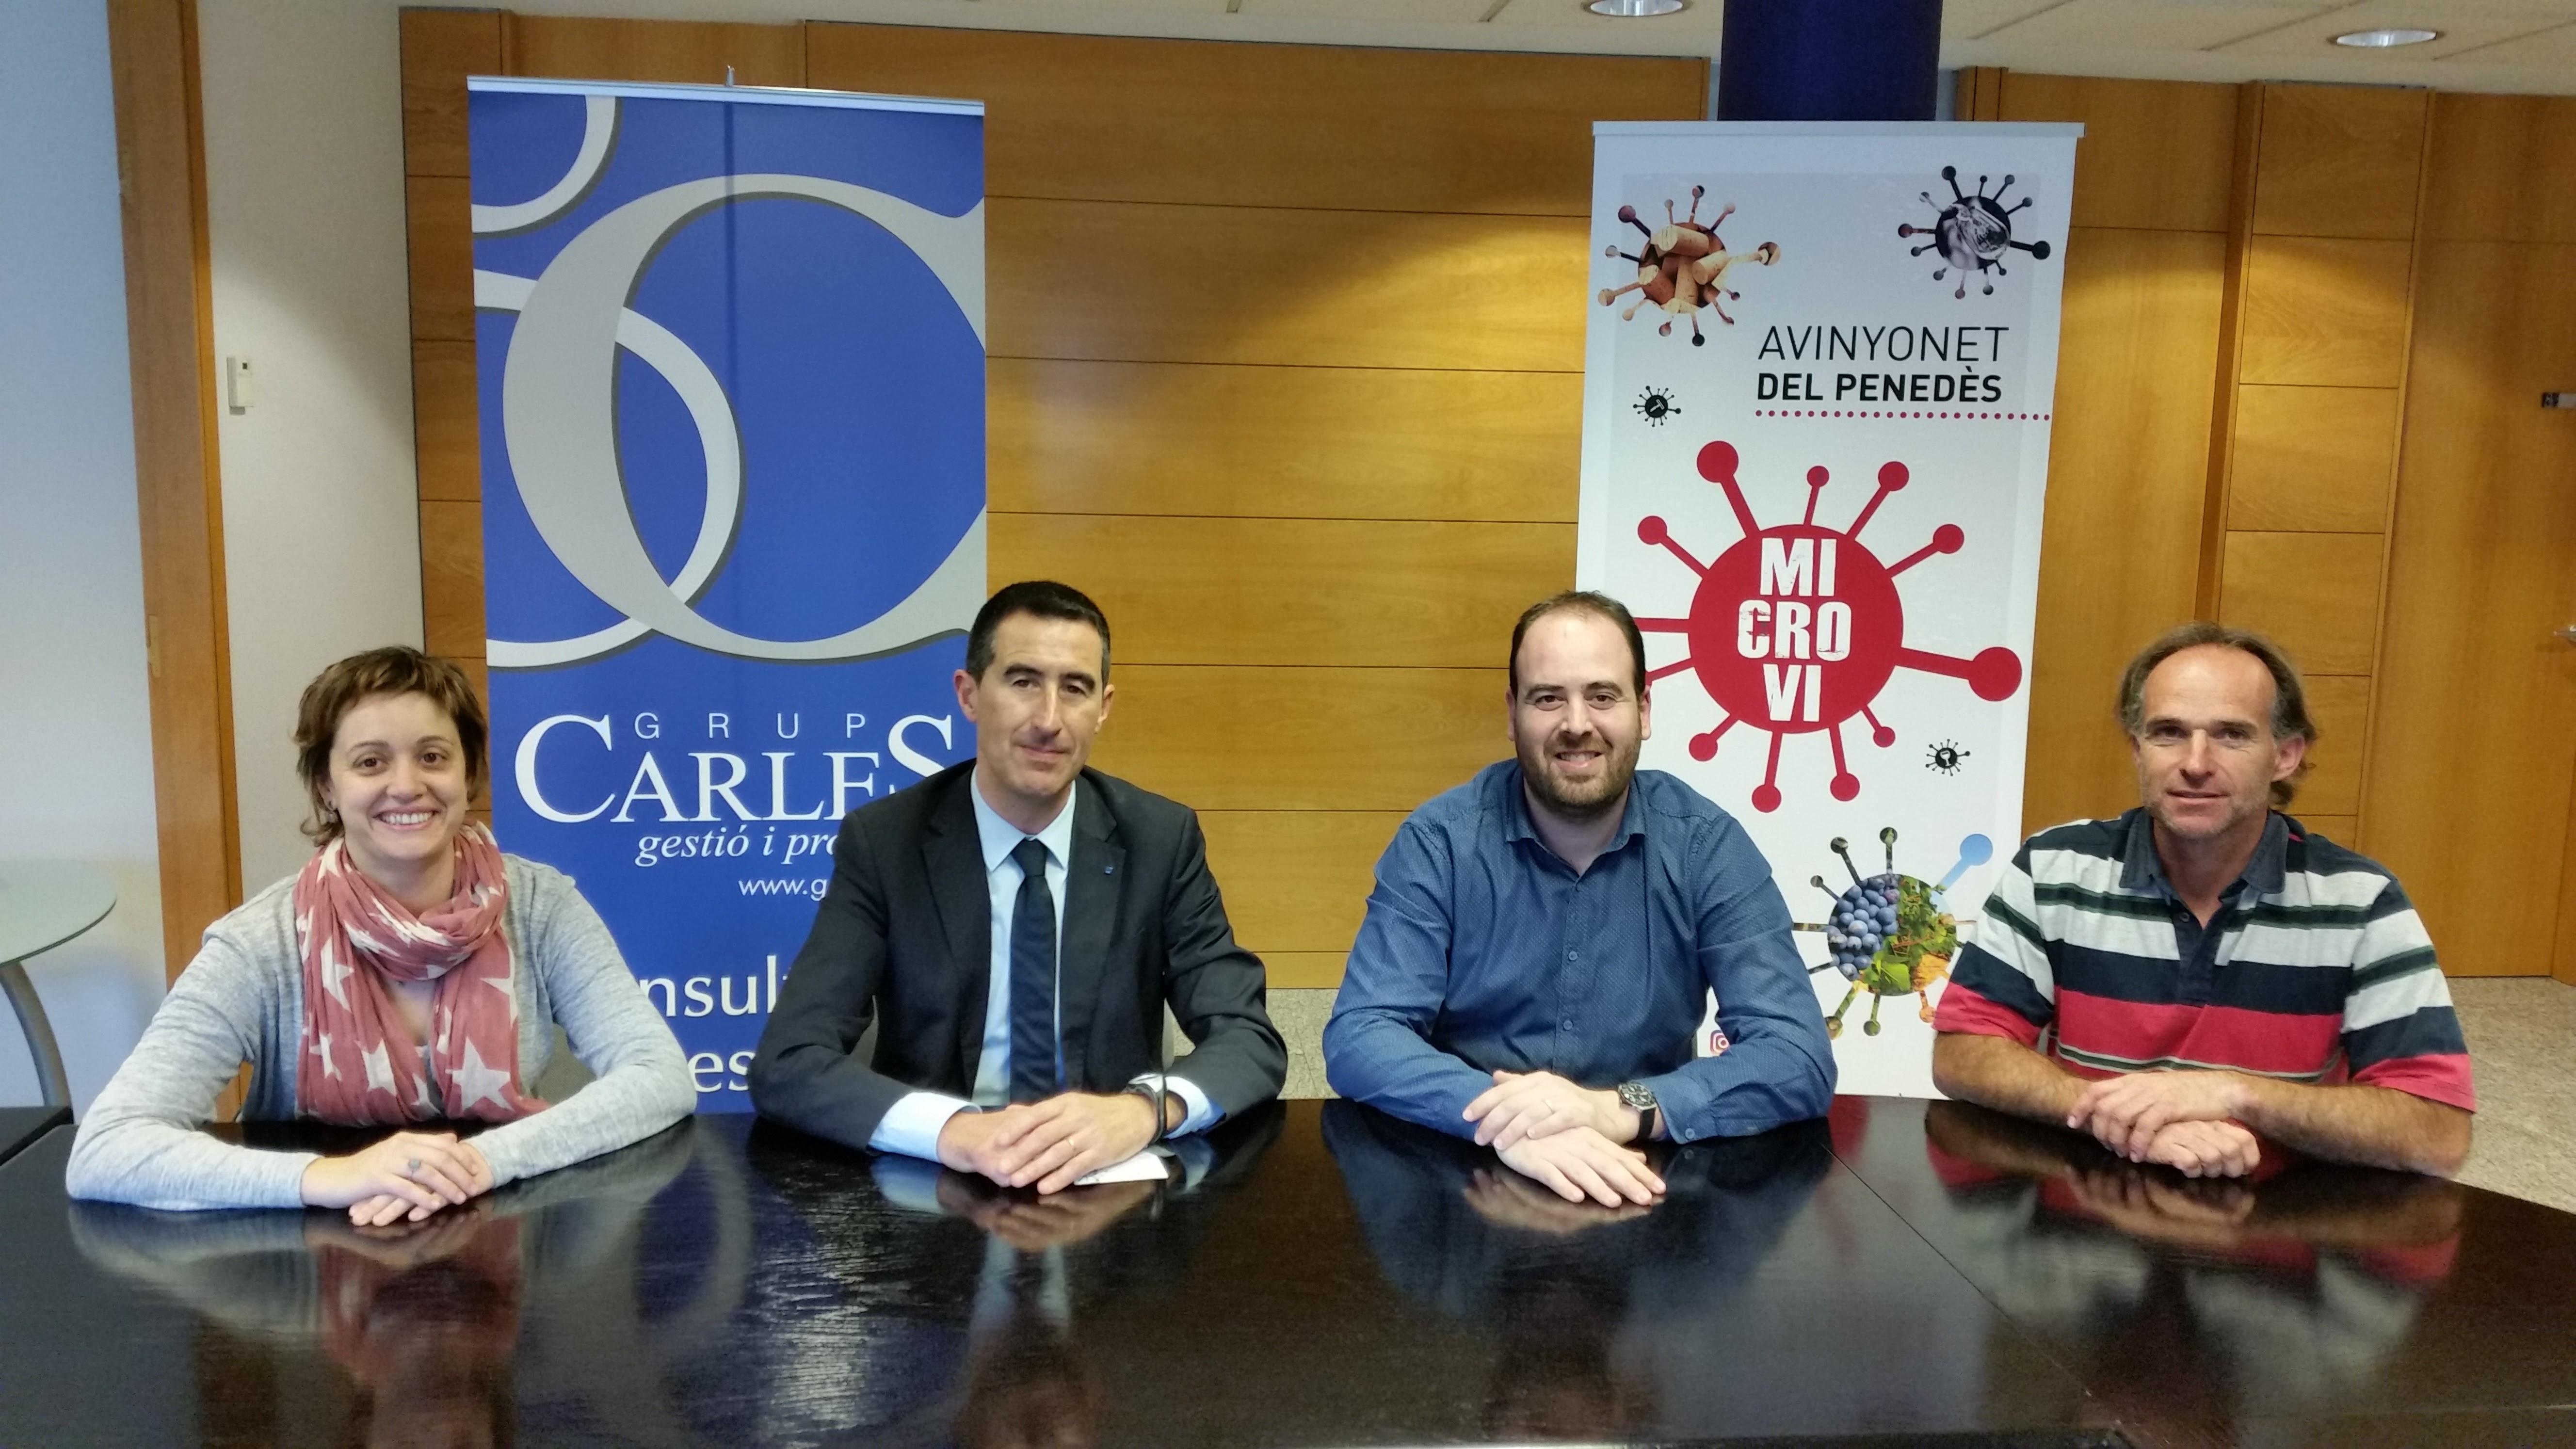 Grup Carles Patrocina Un Dels Actes Del MicroVi 2017